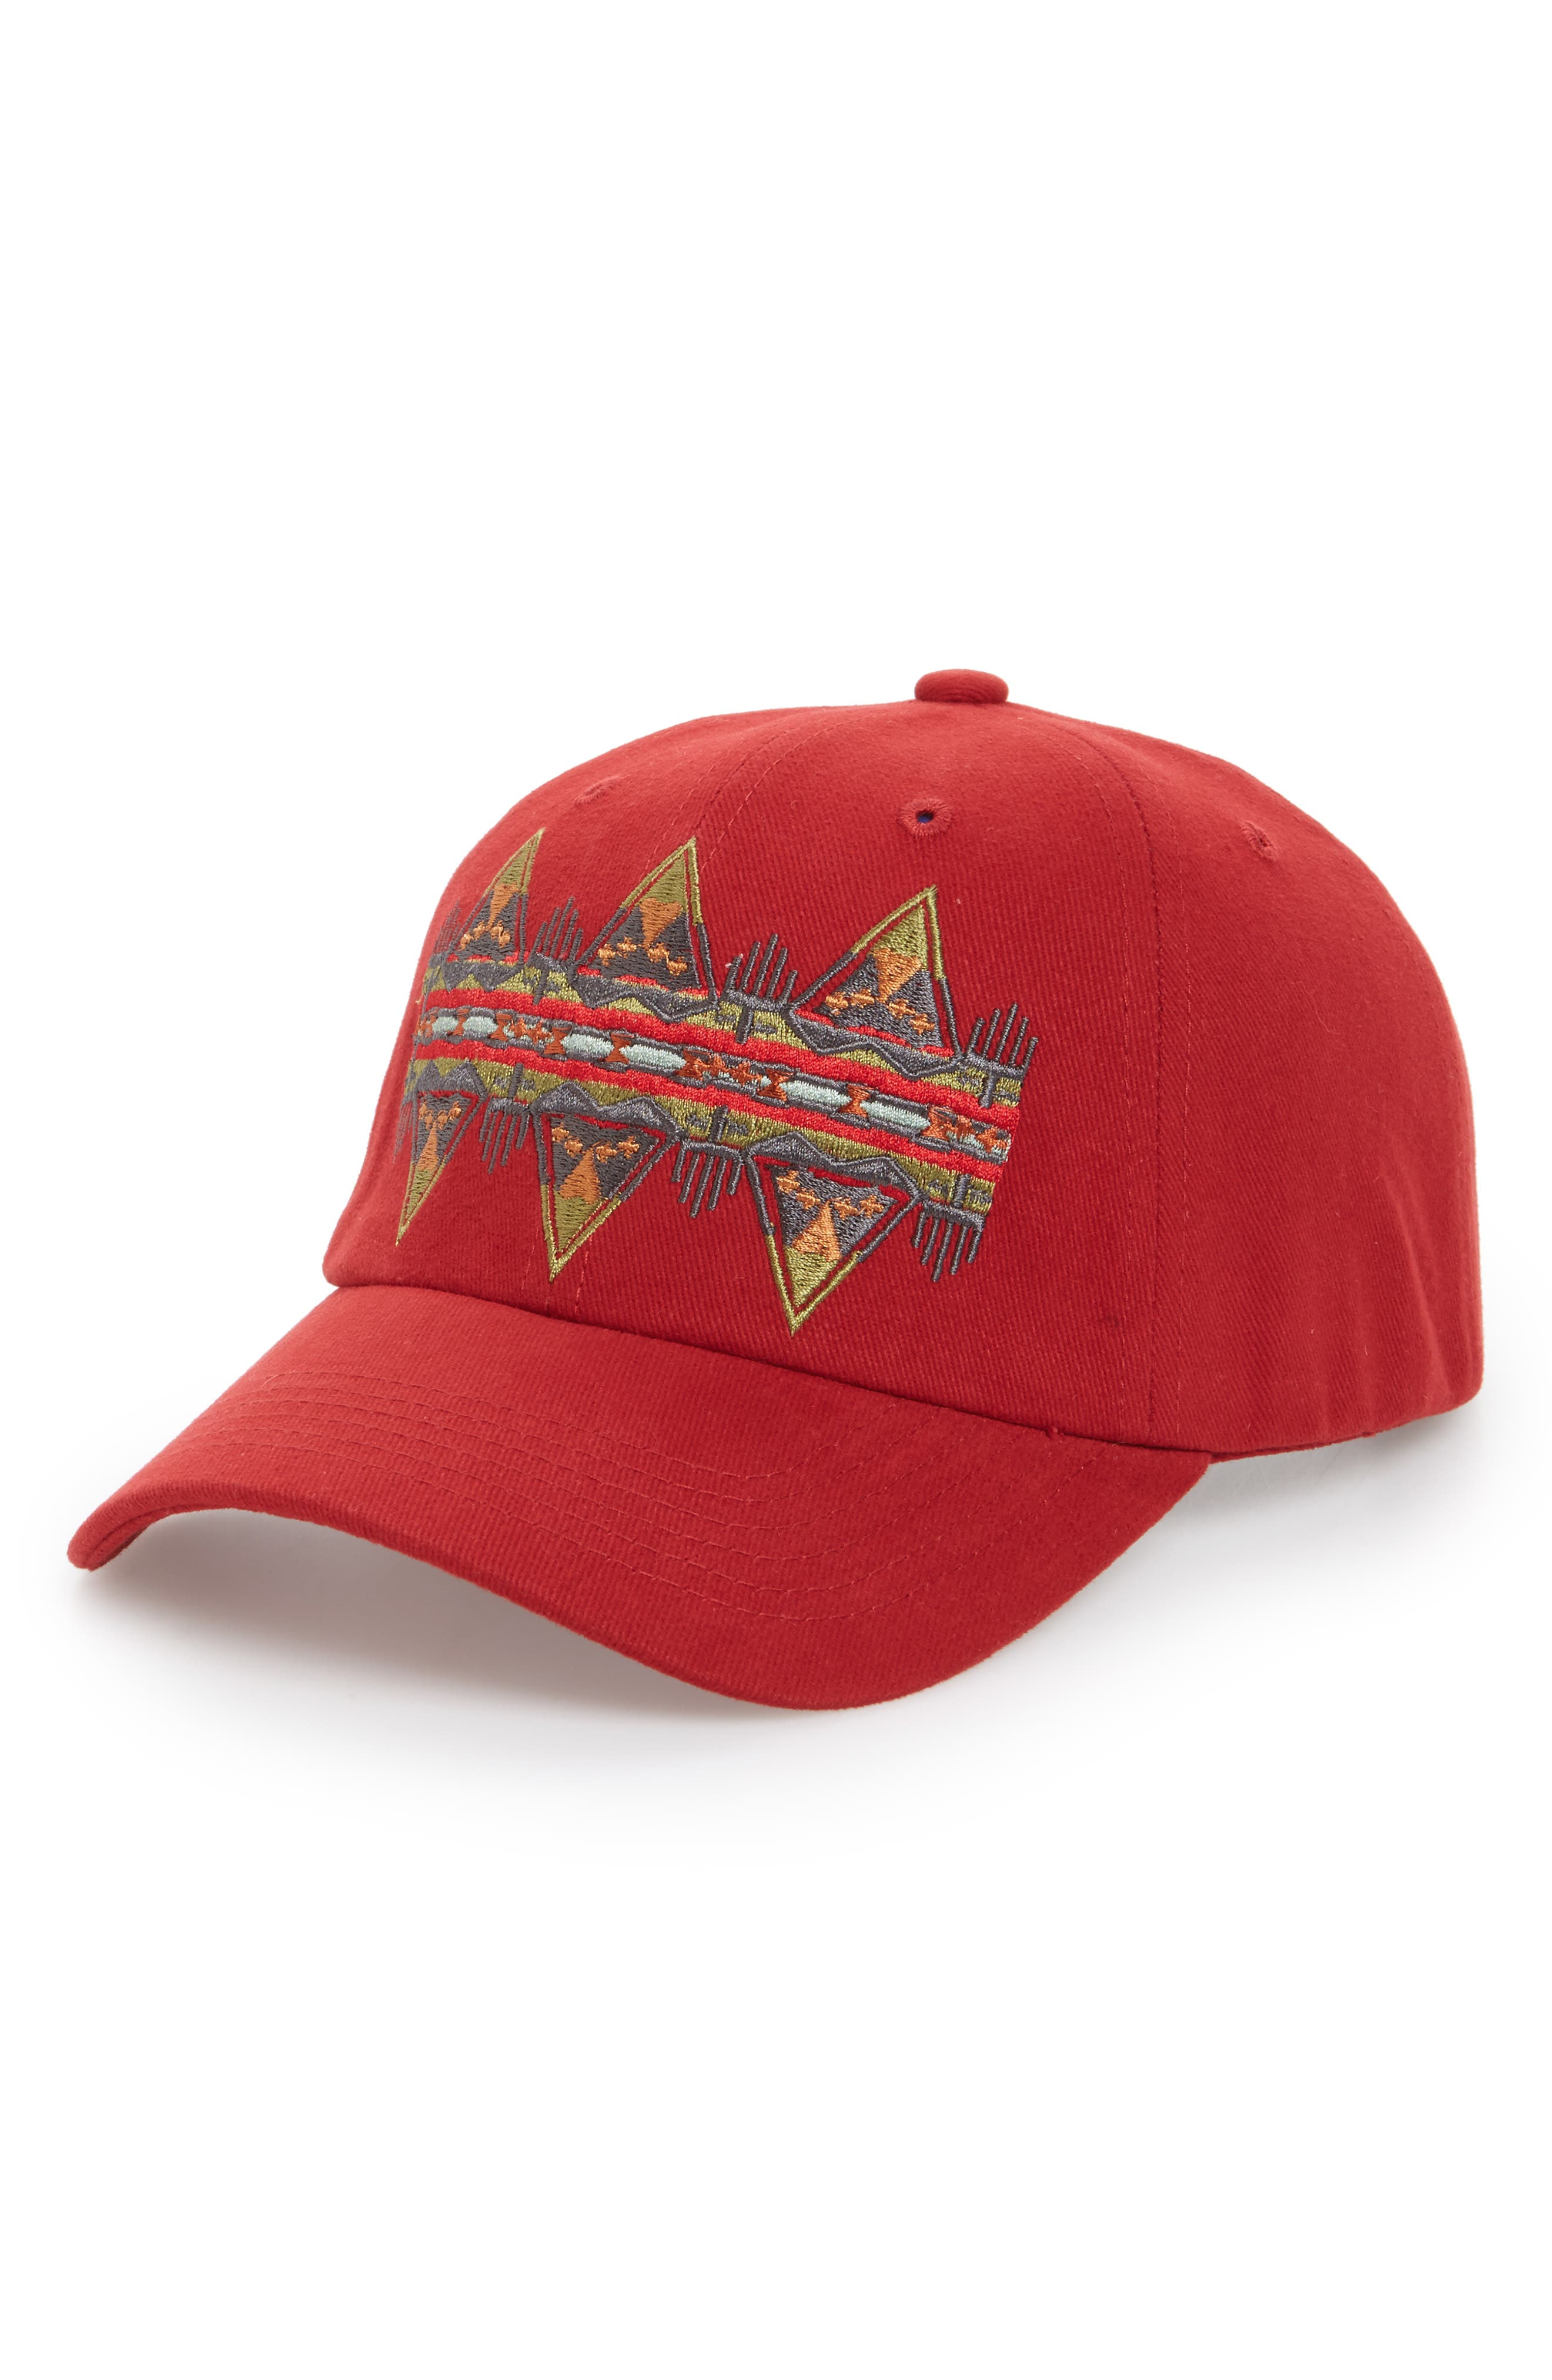 Pendleton Embroidered Ball Cap